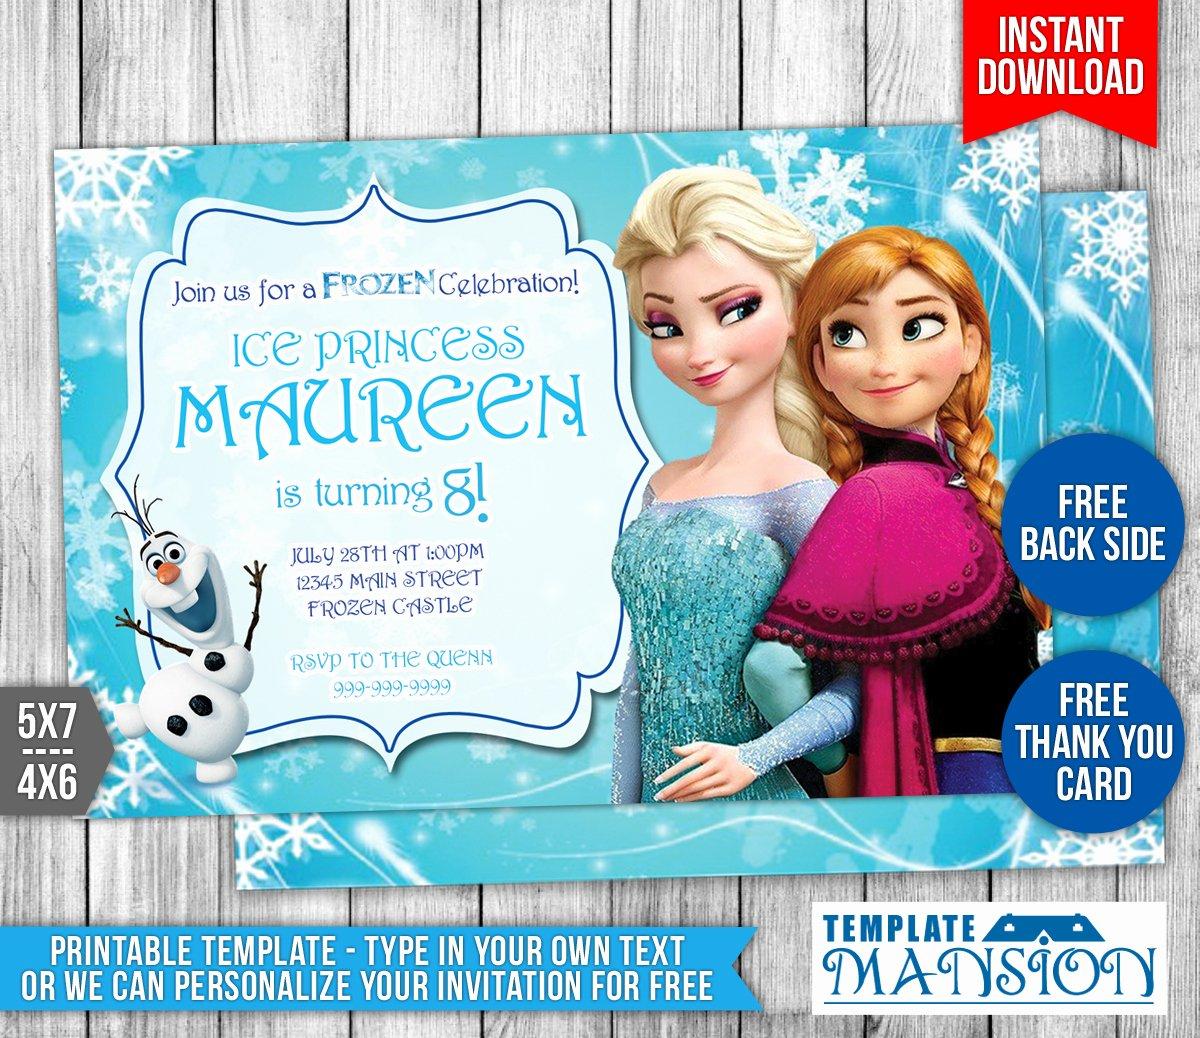 Frozen Birthday Invites Template New Disney Frozen Birthday Invitation 1 by Templatemansion On